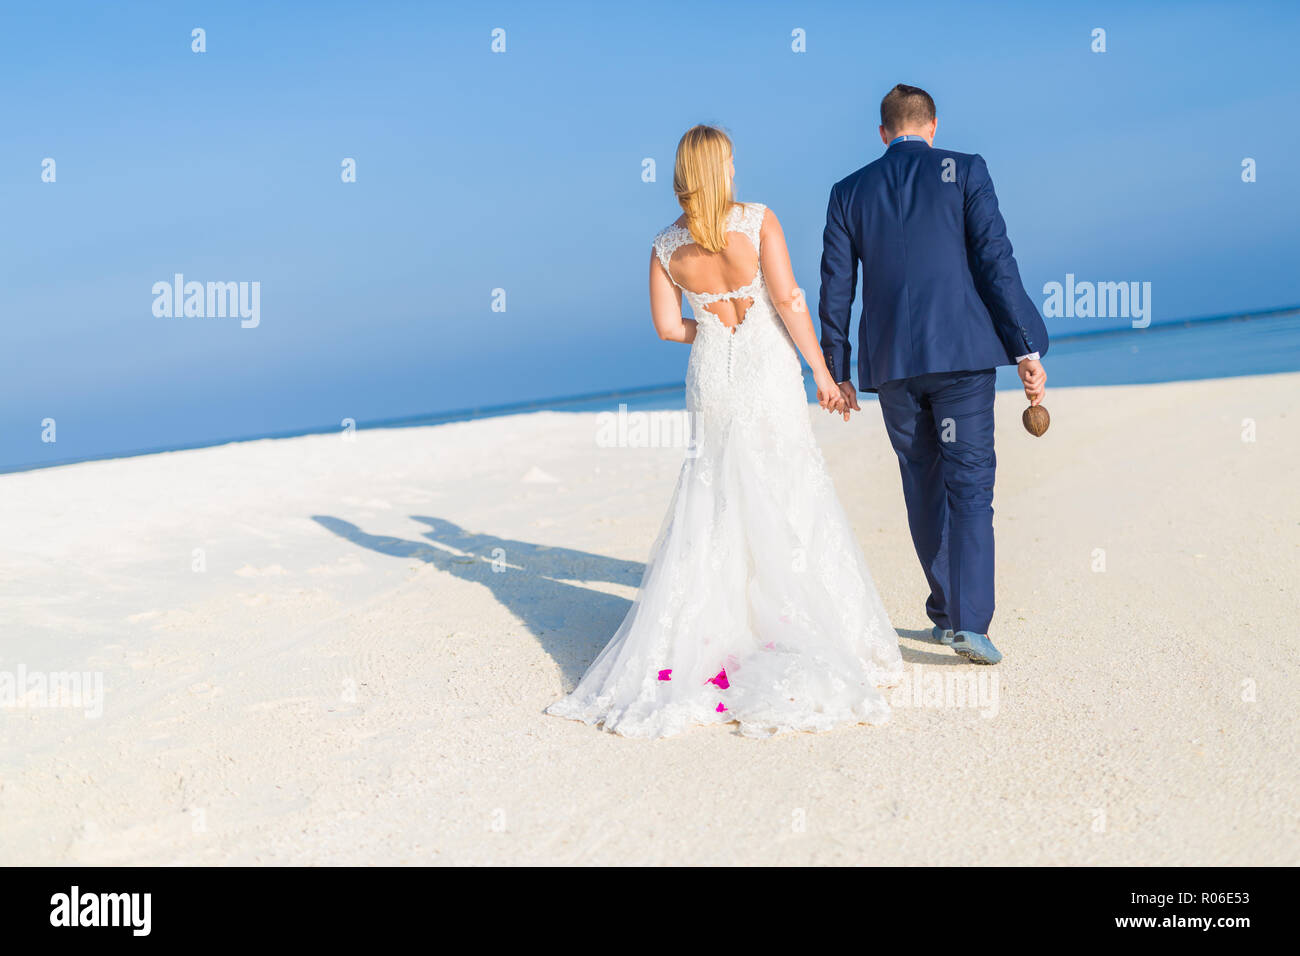 Perfect beach wedding, newlyweds couple, honeymooners. Sunset and love mood. The bride and groom under archway on beach. Romantic sunset, twilight Stock Photo